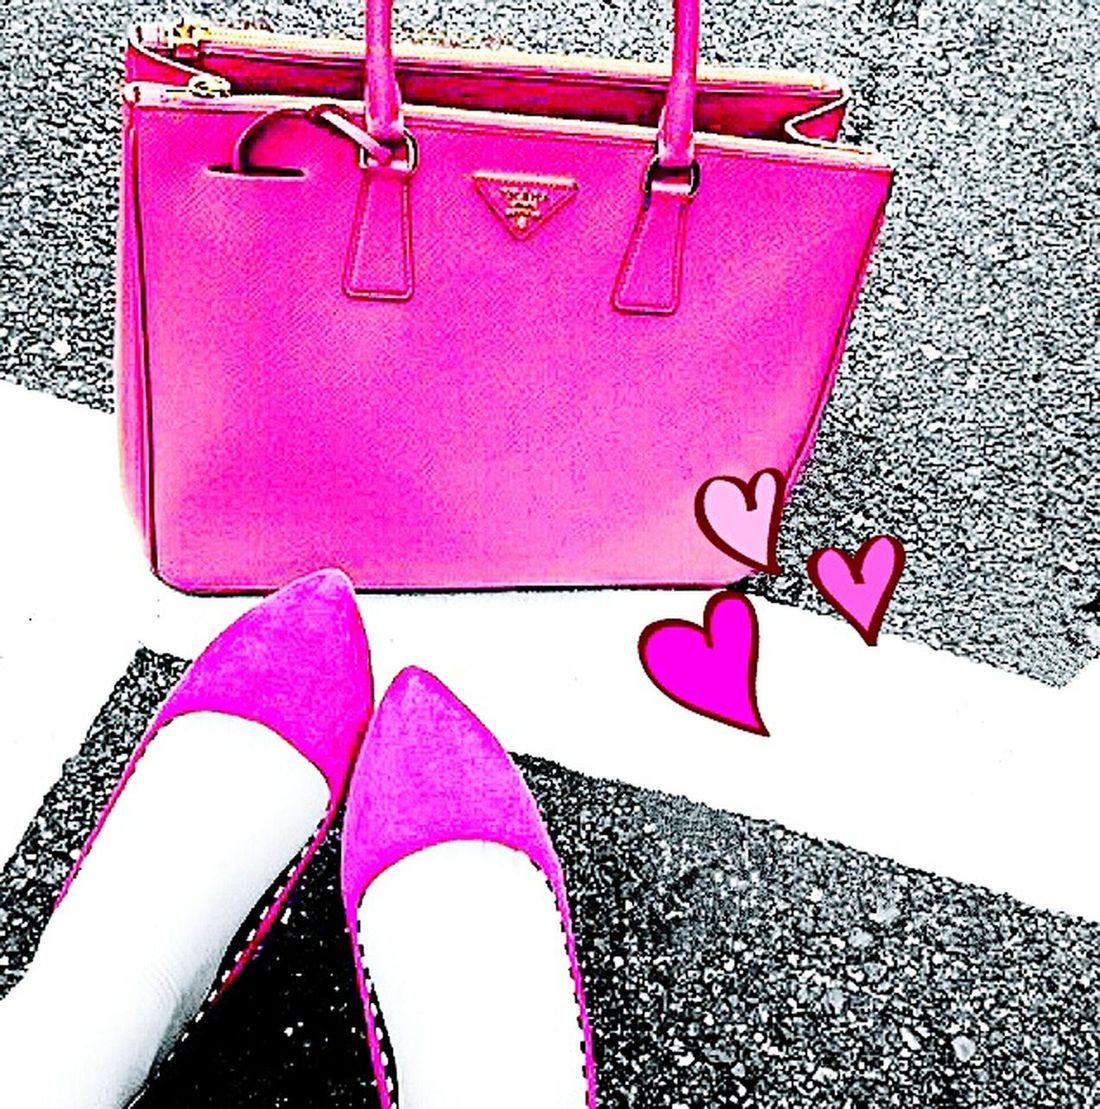 Pink♥ I ♥ Prada Today's Coordinate That's Me